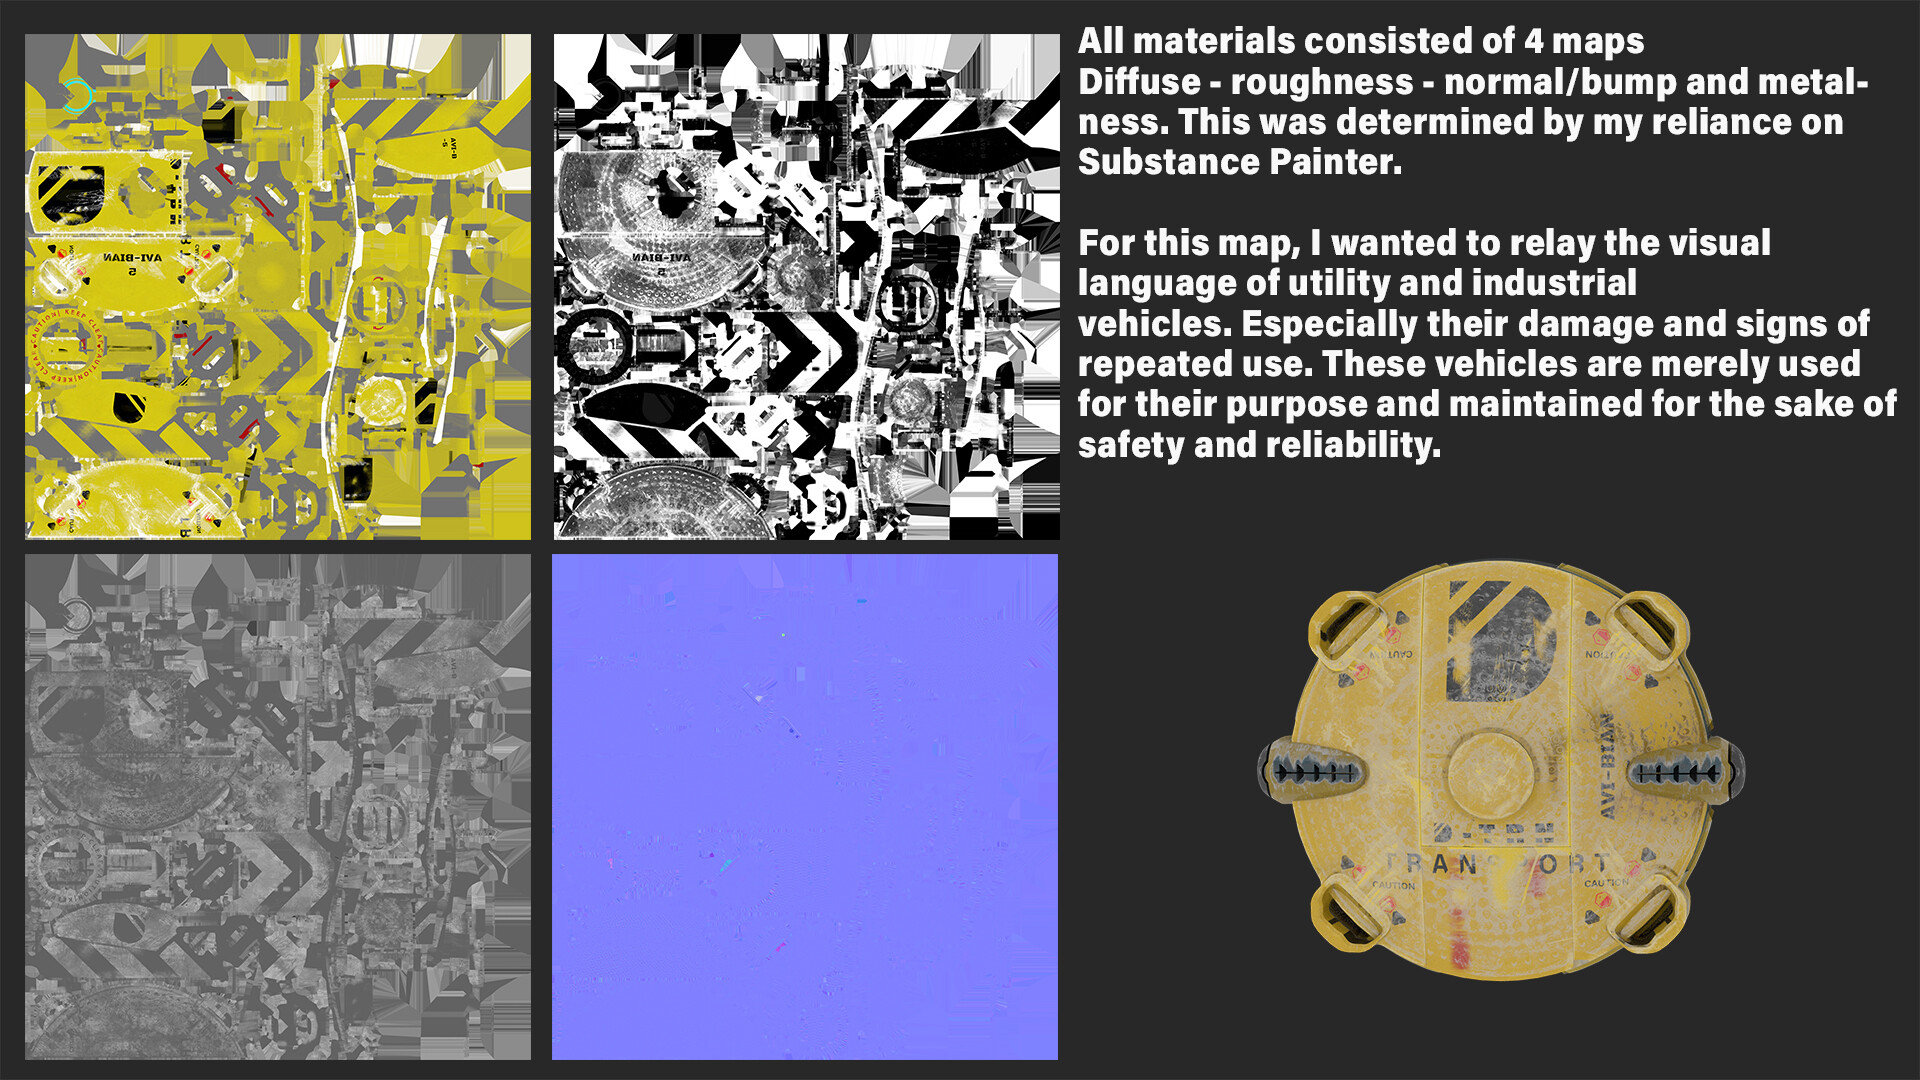 ArtStation - Aaron Dhanda's submission on NVIDIA Metropia 2042